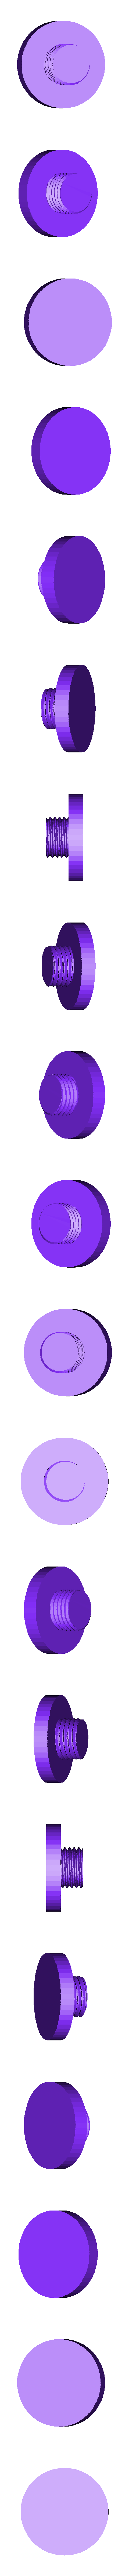 "Ender_3_Adjustable_Feet_-_Foot_v1.stl Télécharger fichier STL gratuit Ender 3 Pieds réglables (2"") • Modèle à imprimer en 3D, FedorSosnin"